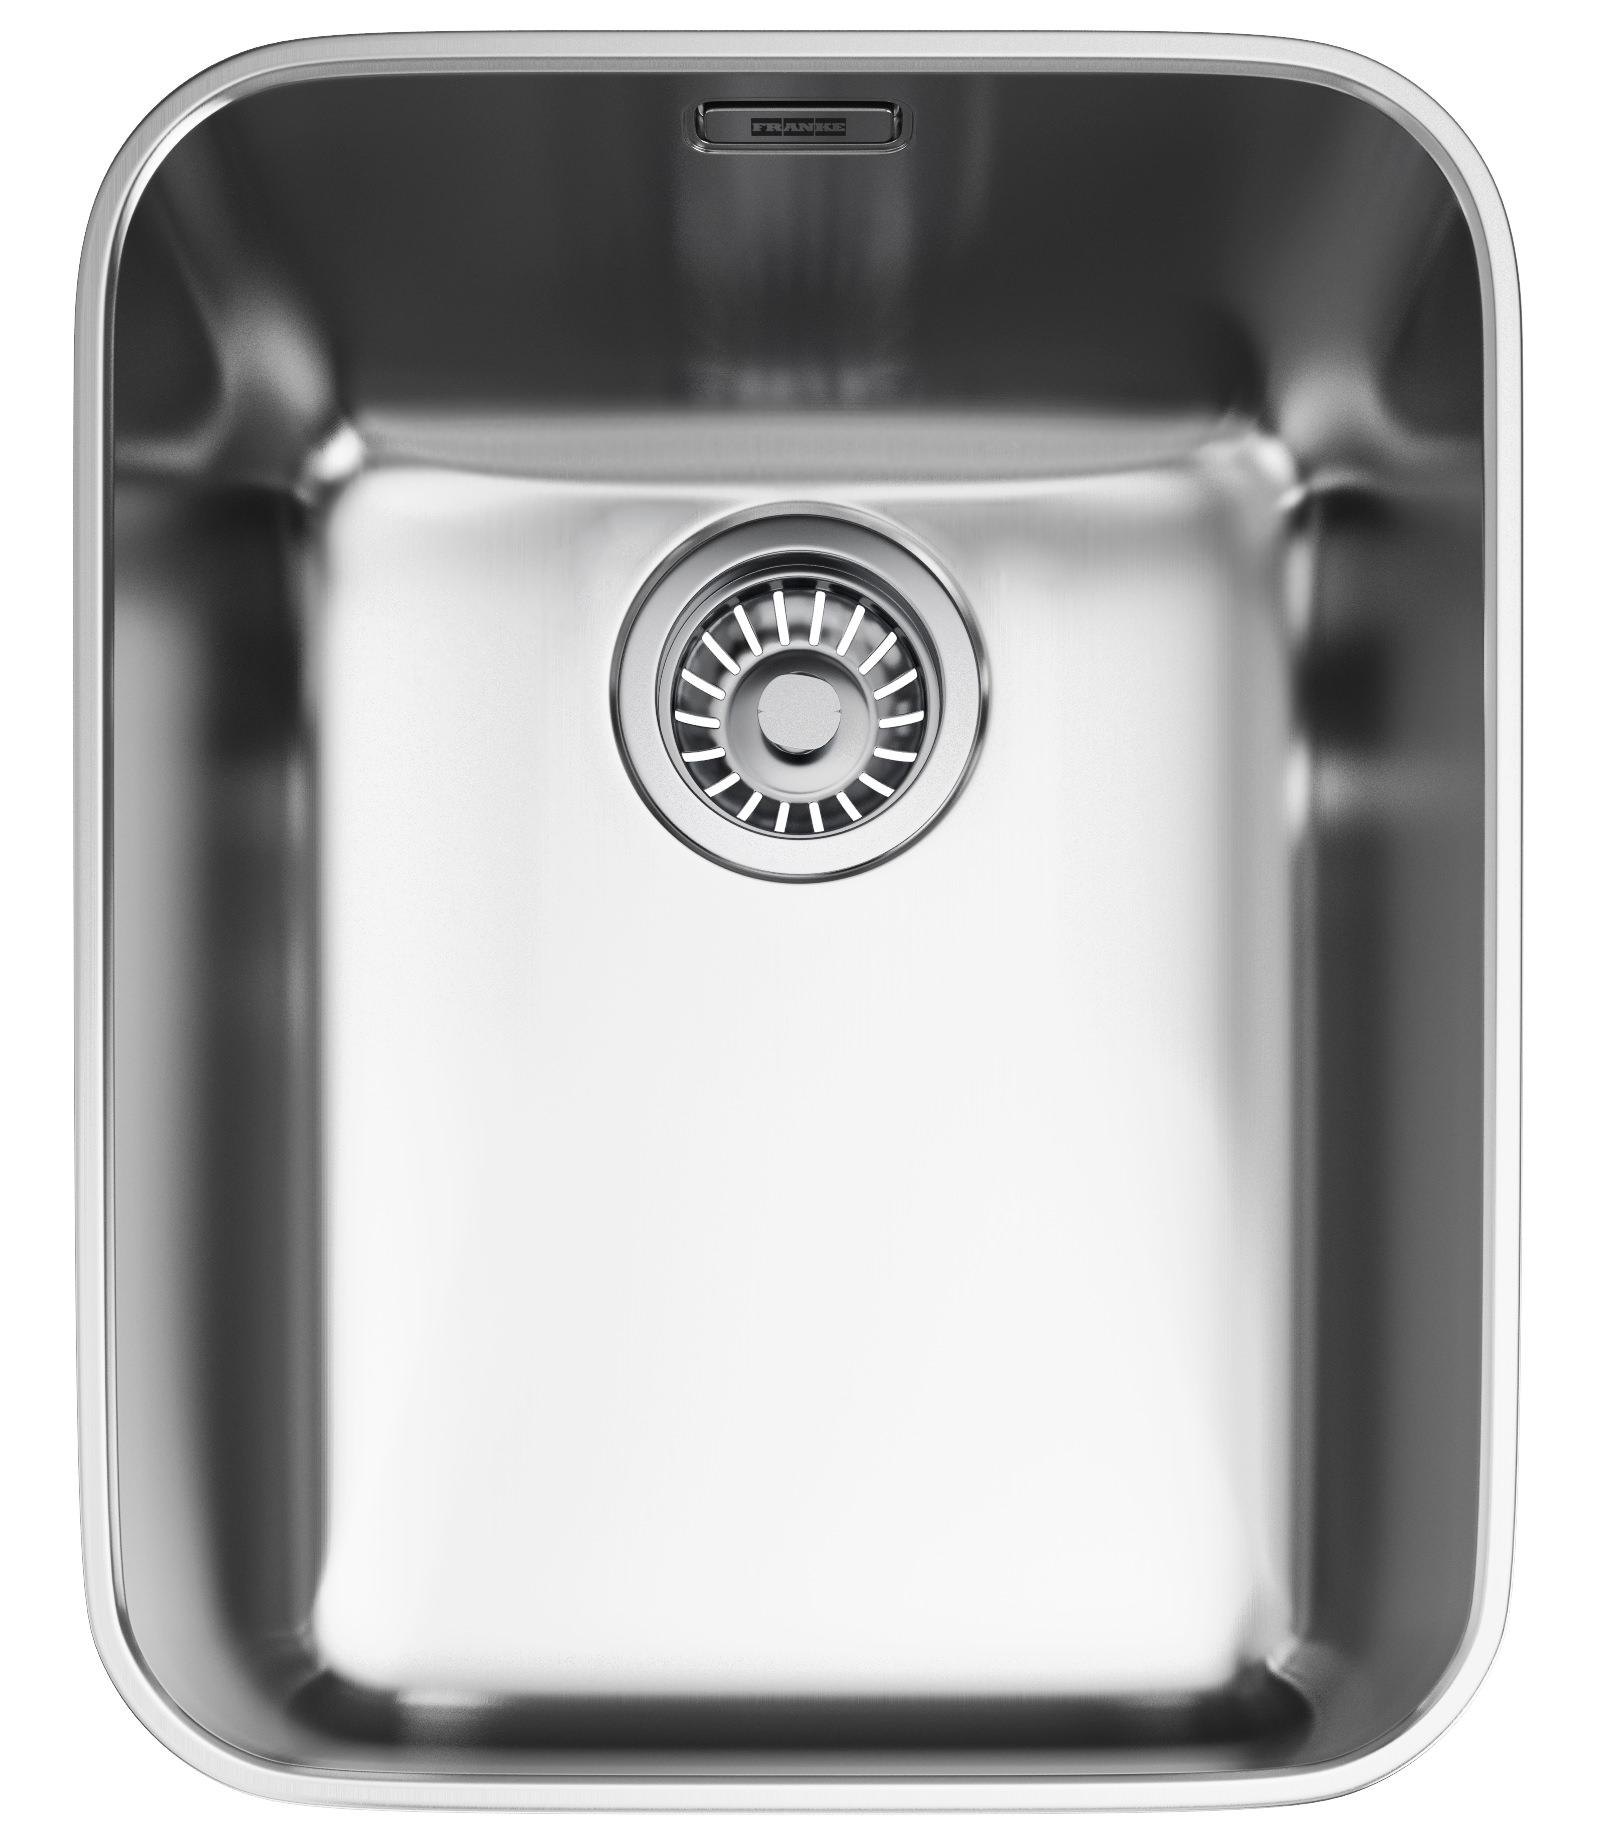 franke kitchen sinks oakley sink backpack stealth black ariane arx 110 35 stainless steel undermount ...